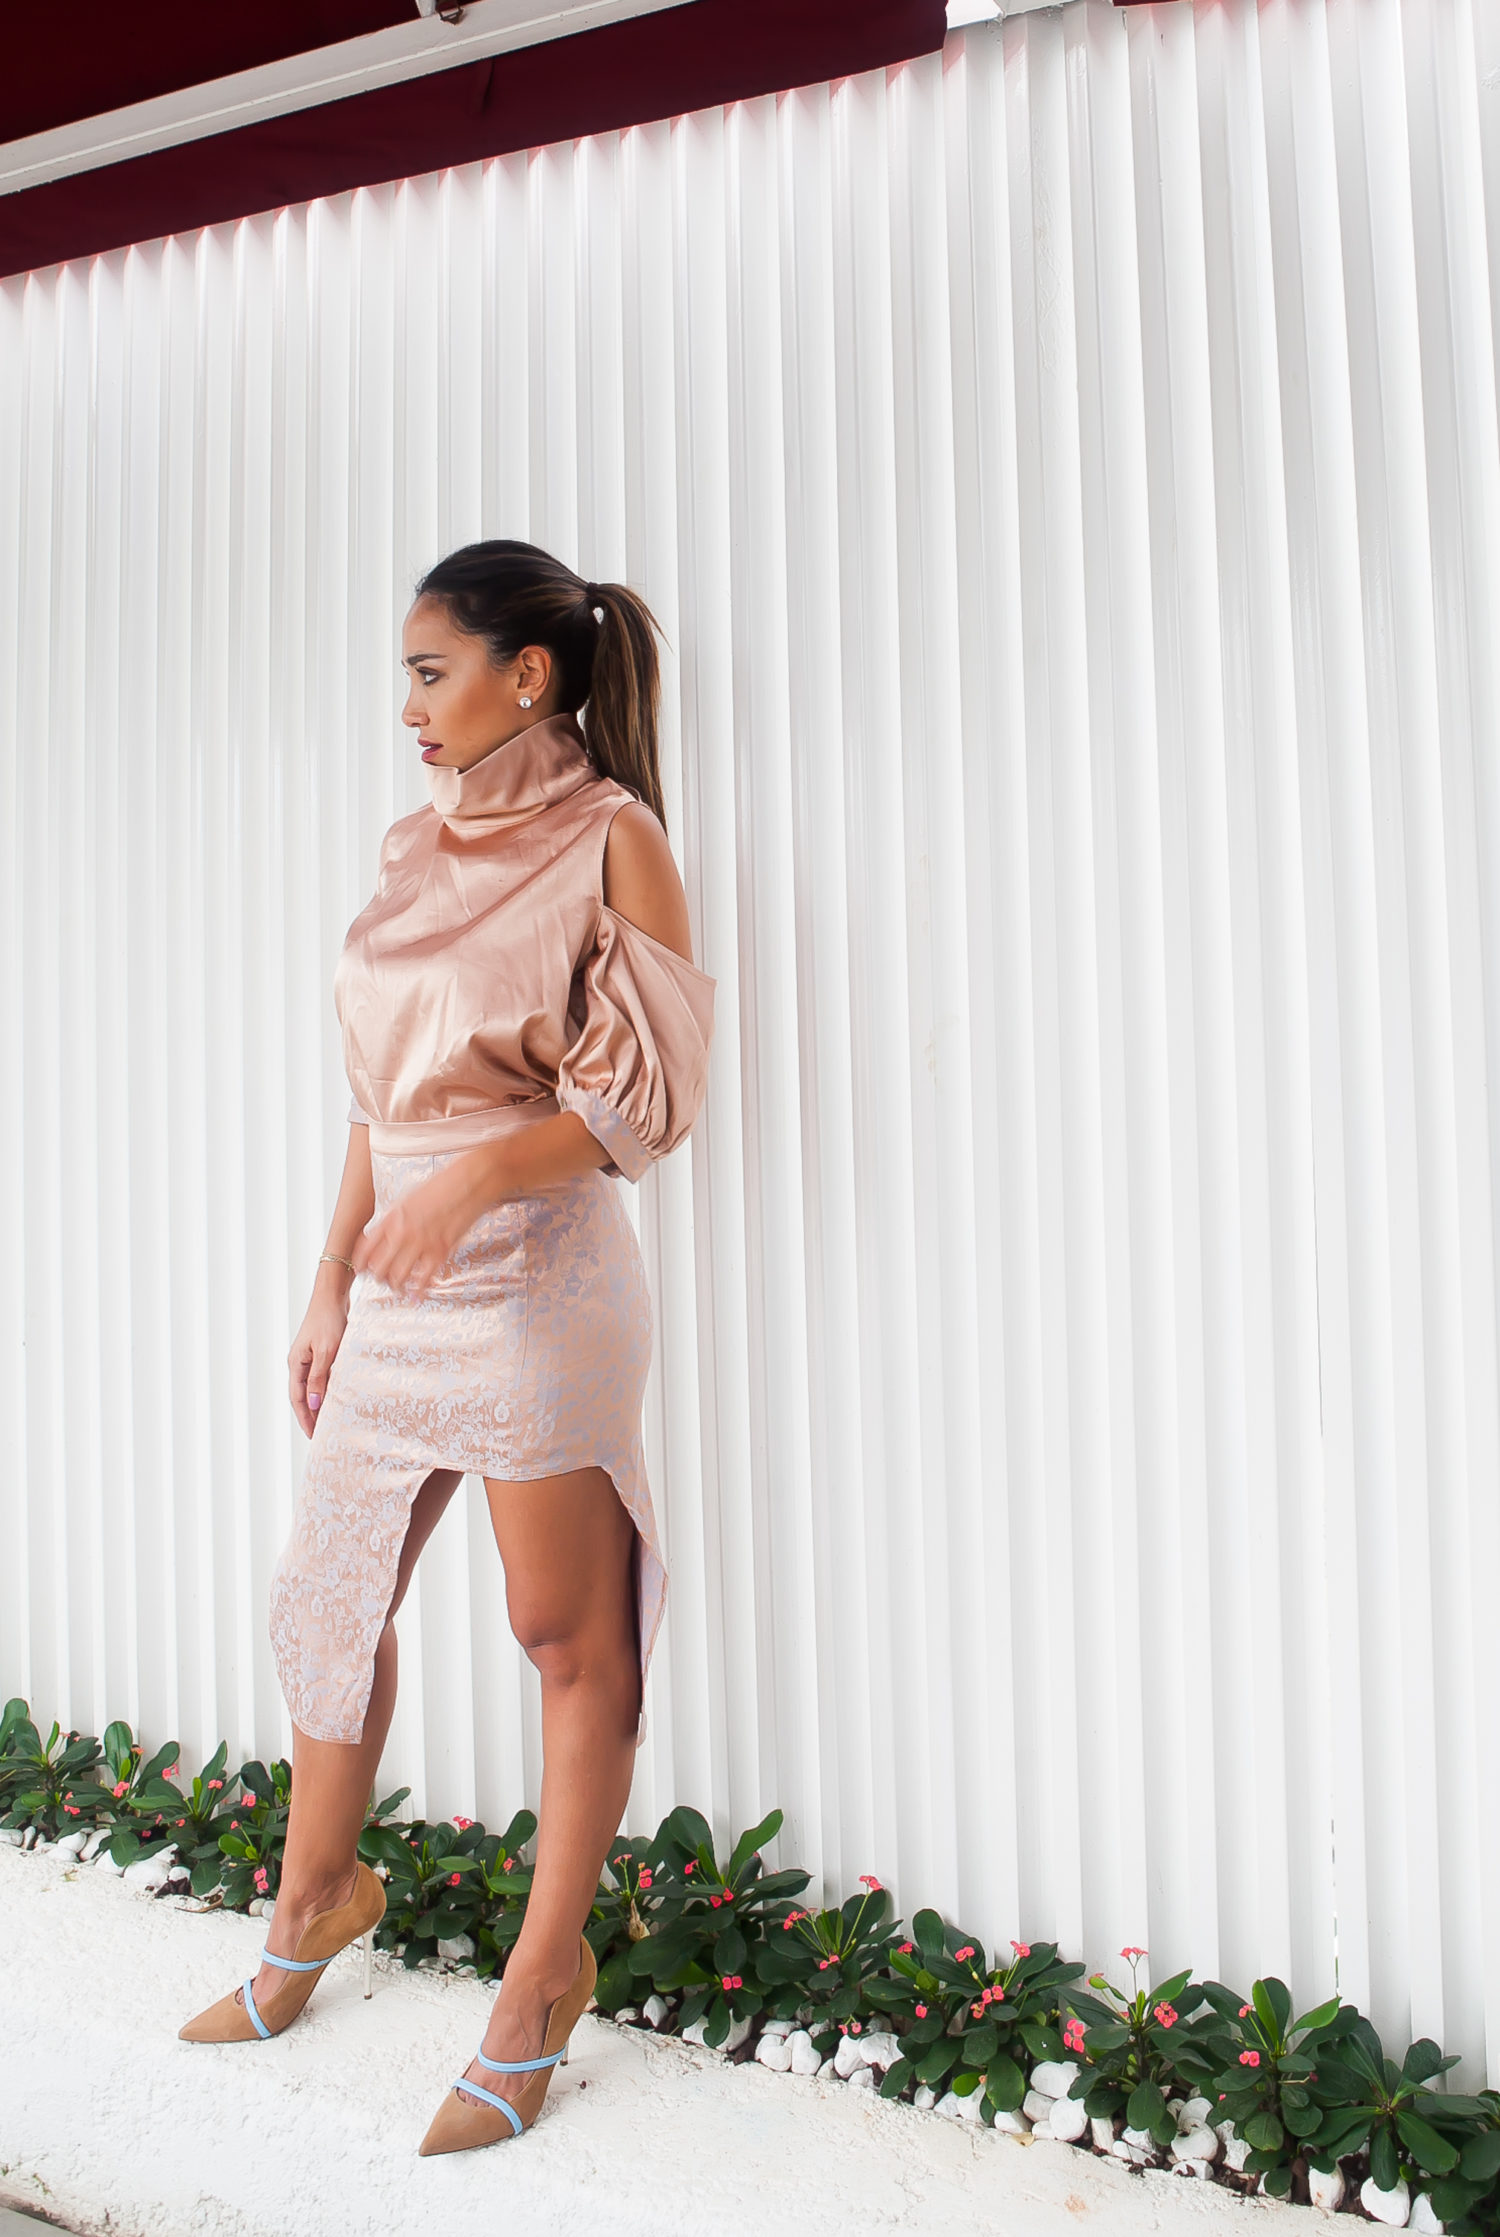 FAFA – The New Womenswear Brand All Cool Girls Will Actually Love!